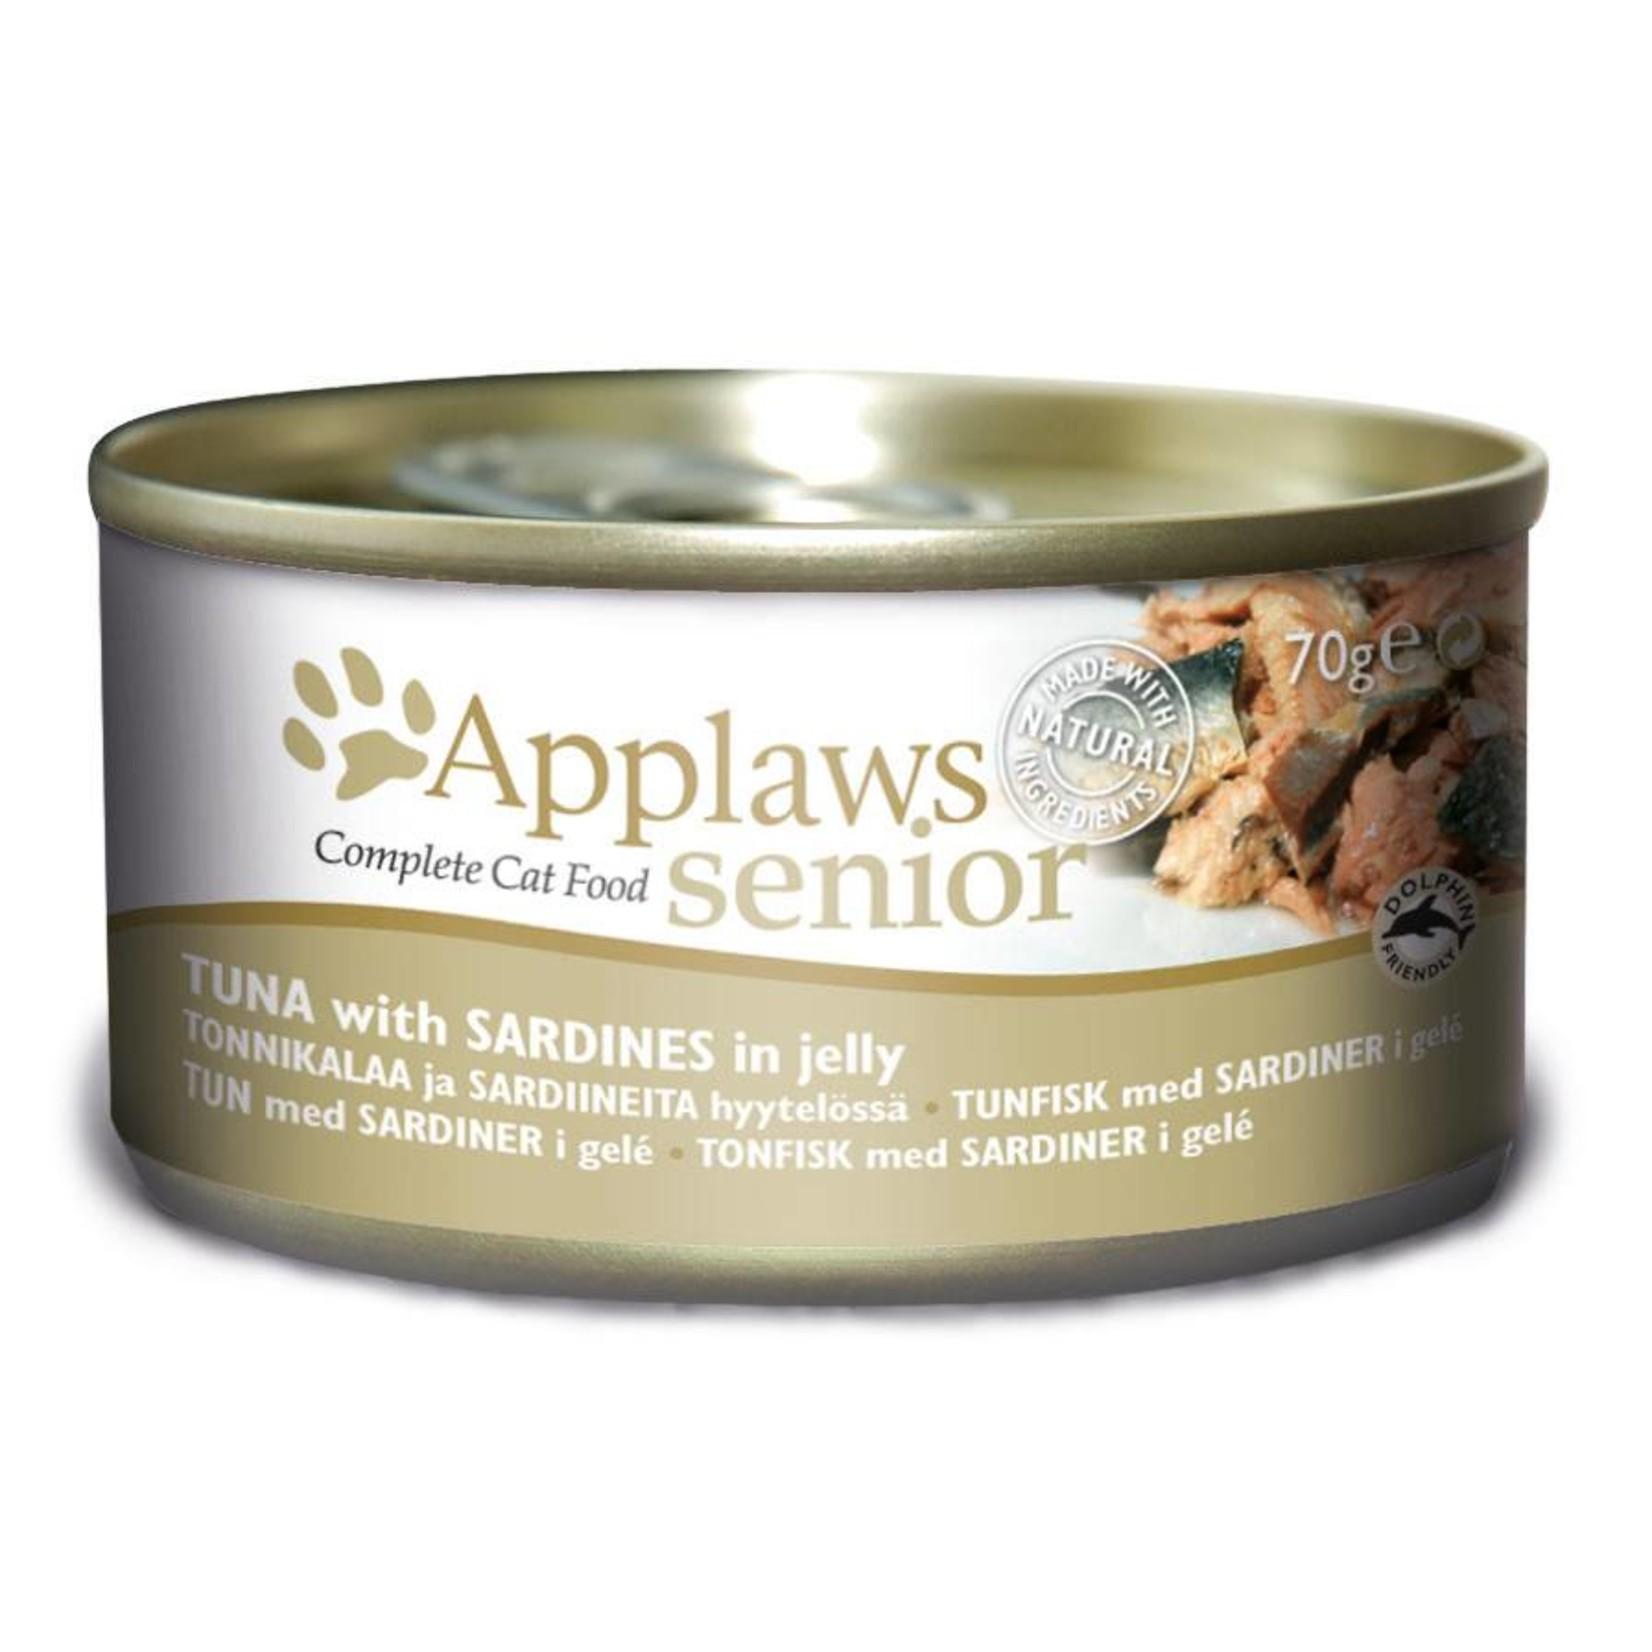 Applaws Cat Wet Food Senior Tuna with Sardines, 70g